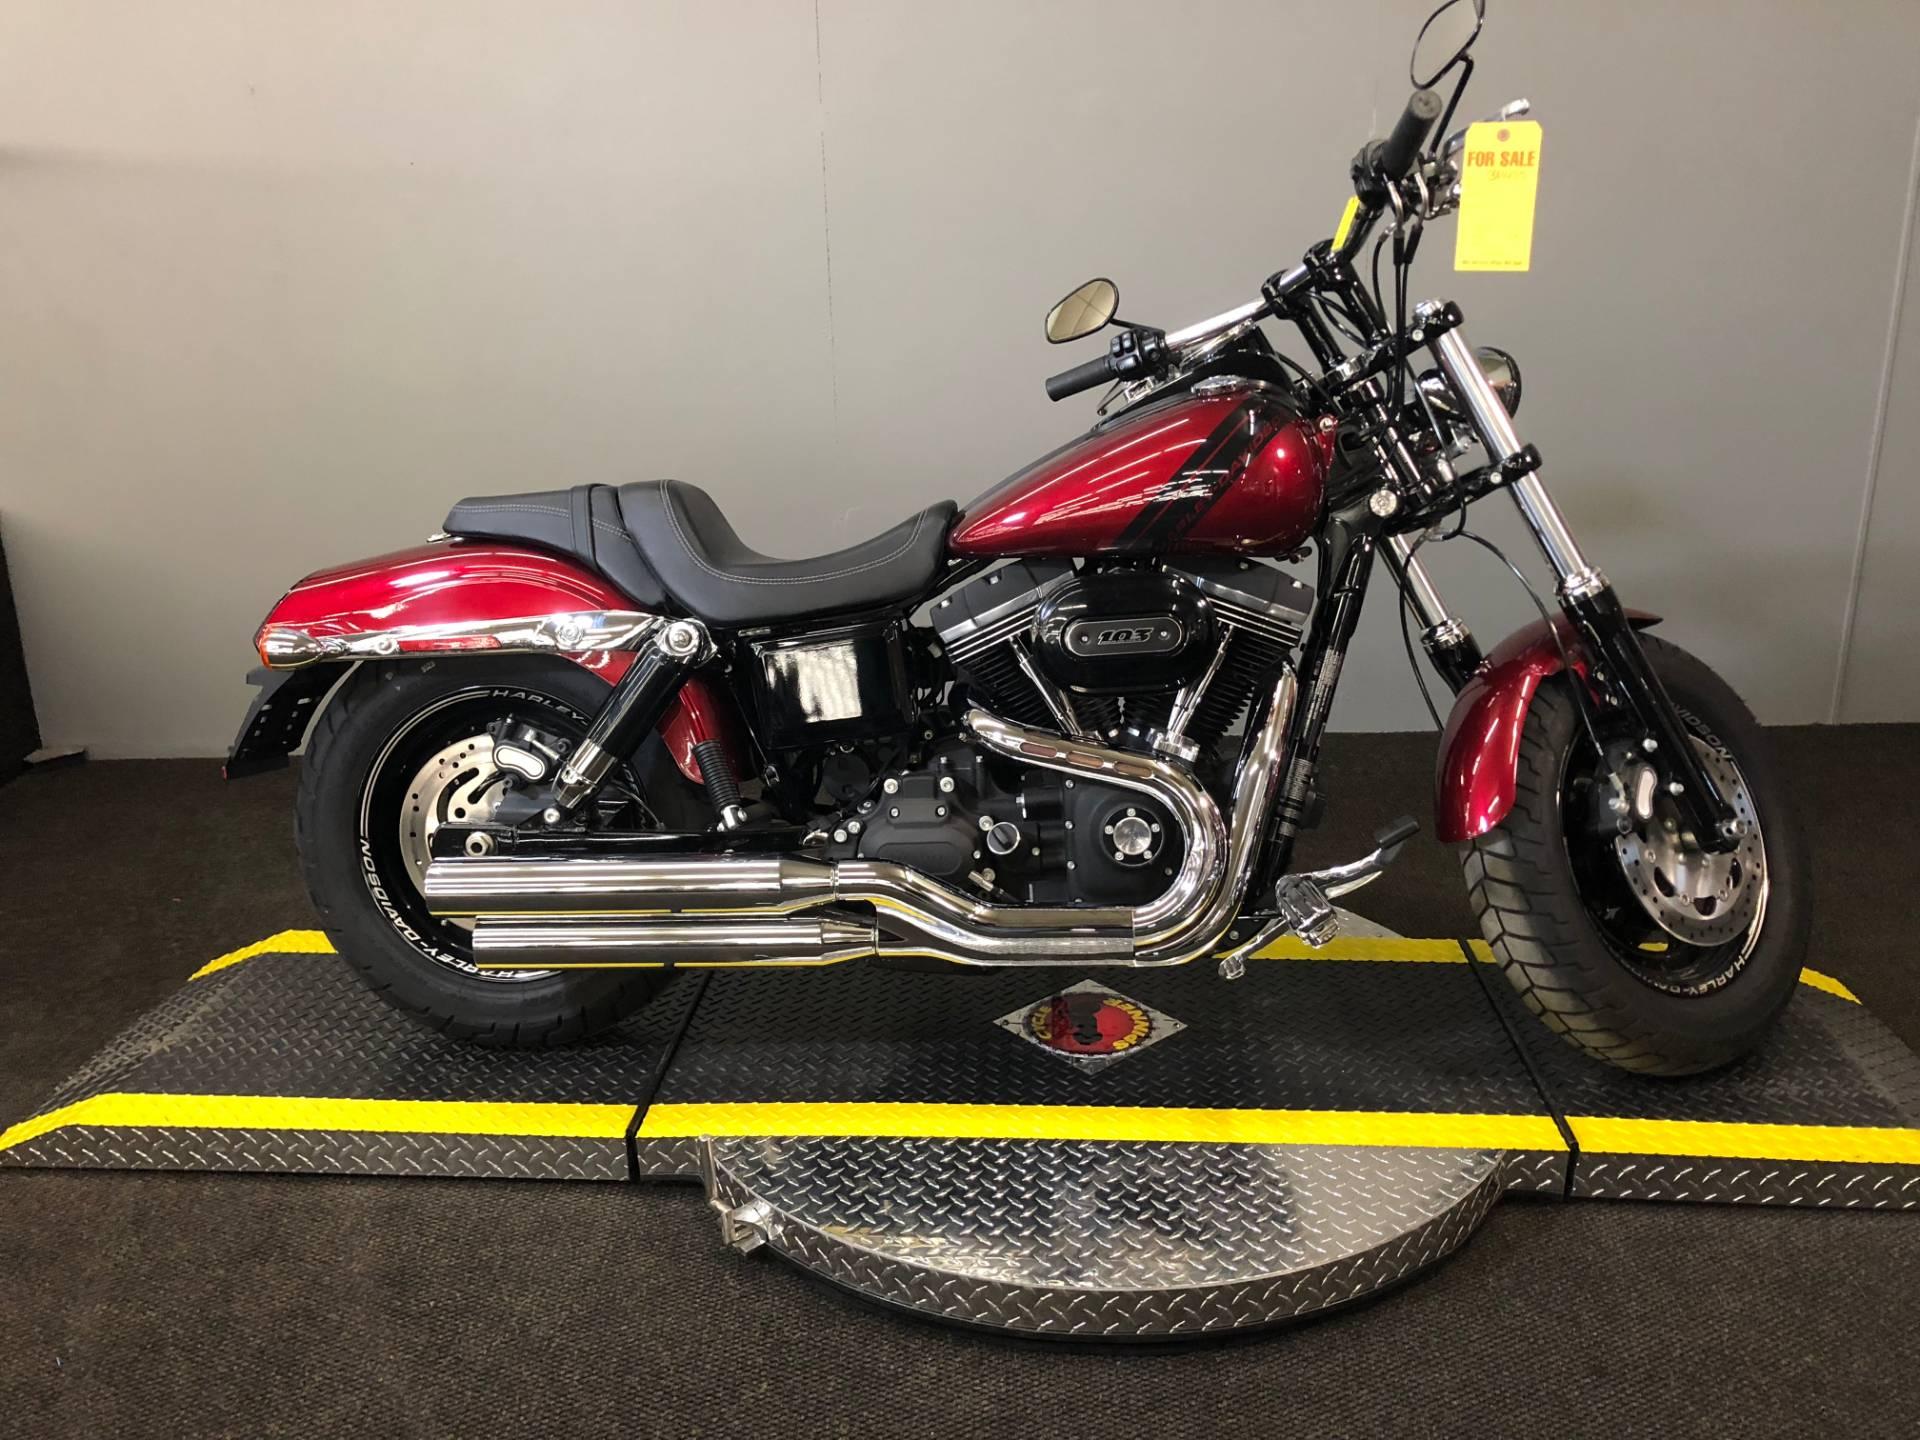 2016 Harley Davidson Fat Bob In Tyrone Pennsylvania